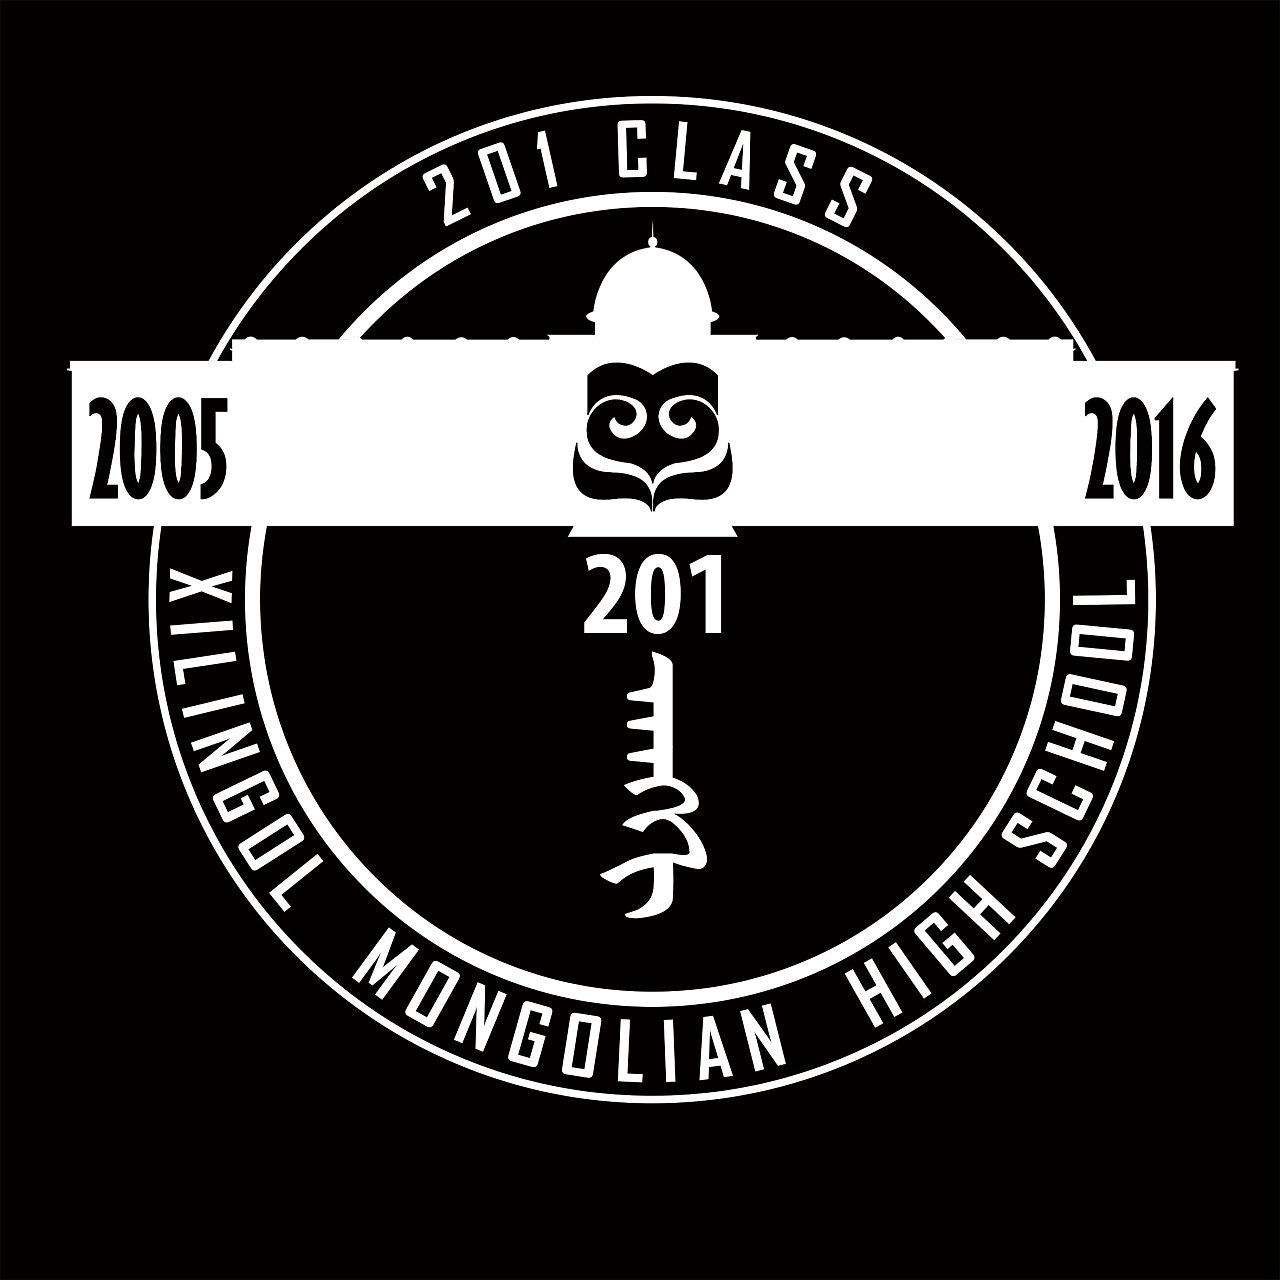 【t恤】同学聚会纪念t恤设计|平面|图案|_narsu图片